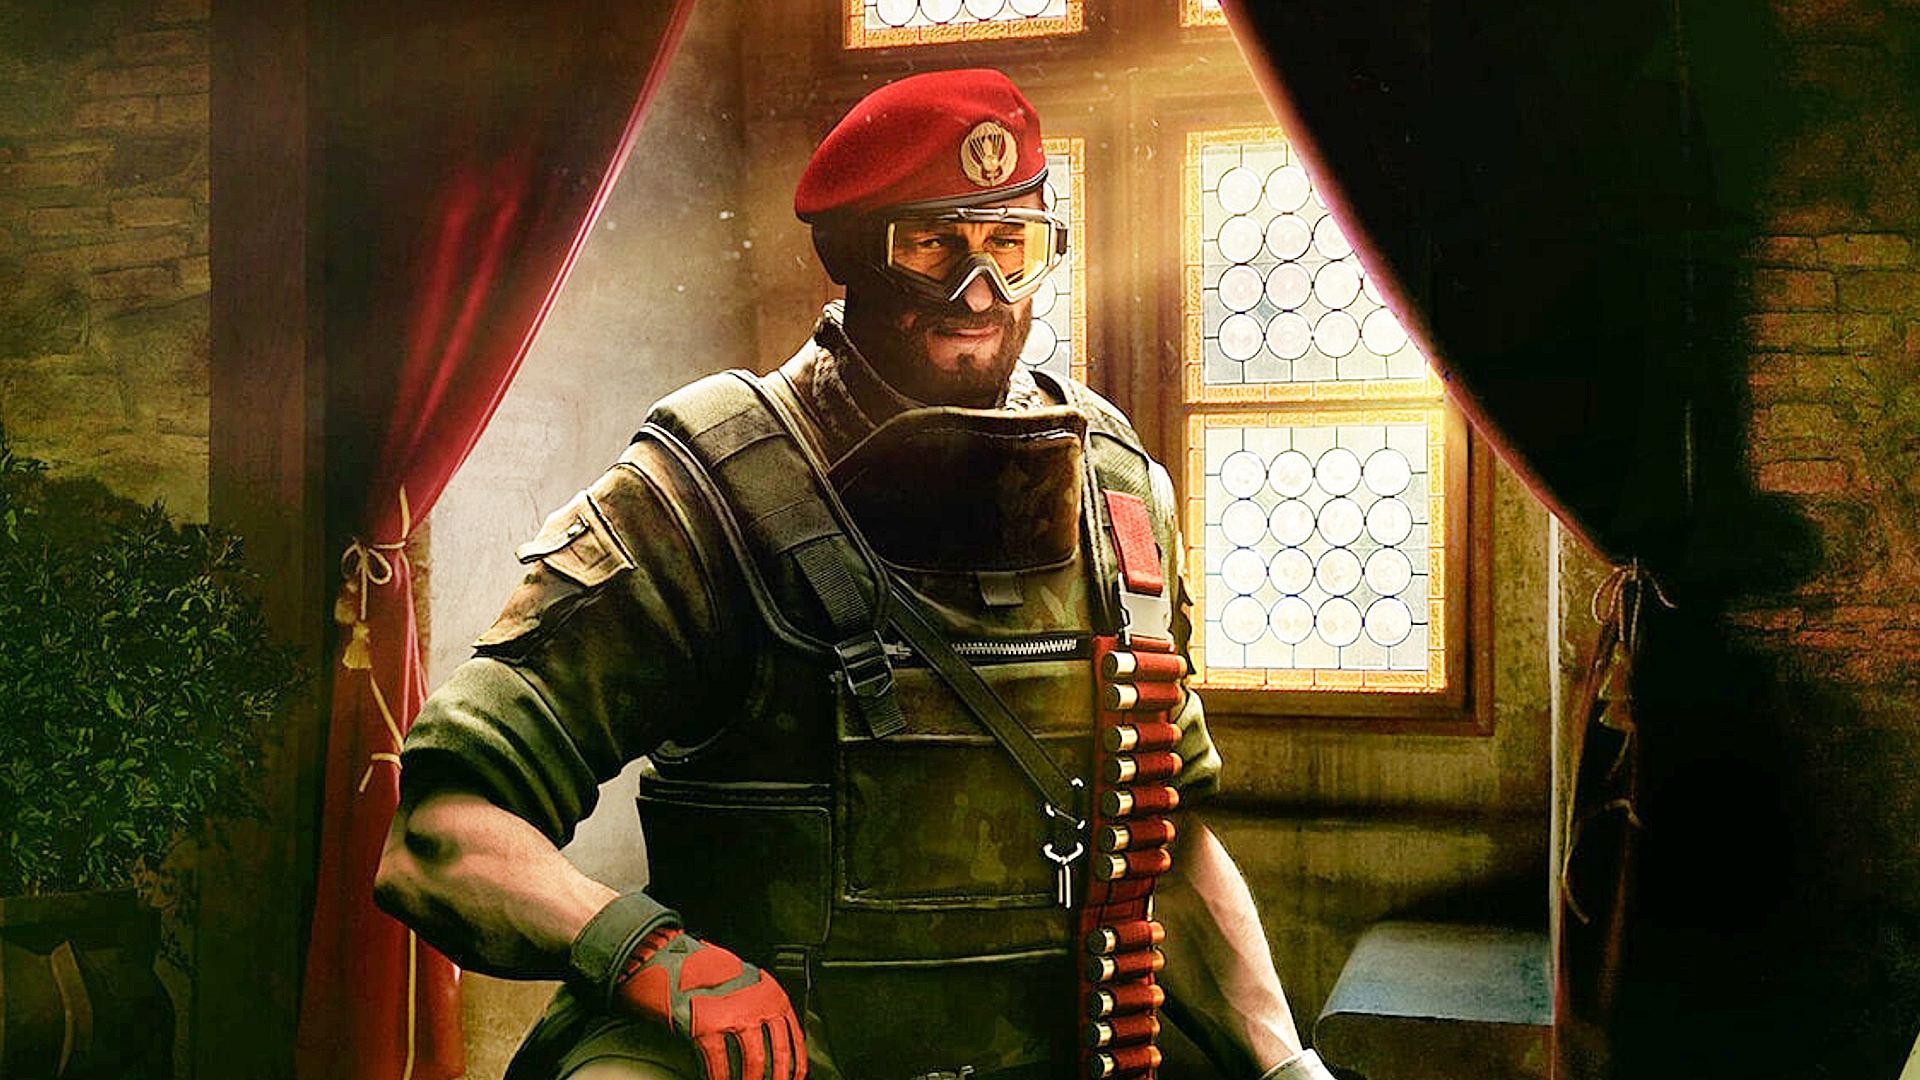 Rainbow Six Siege TS update includes big nerfs (every gun, Maestro) and buffs (Ela, Dokkaebi)